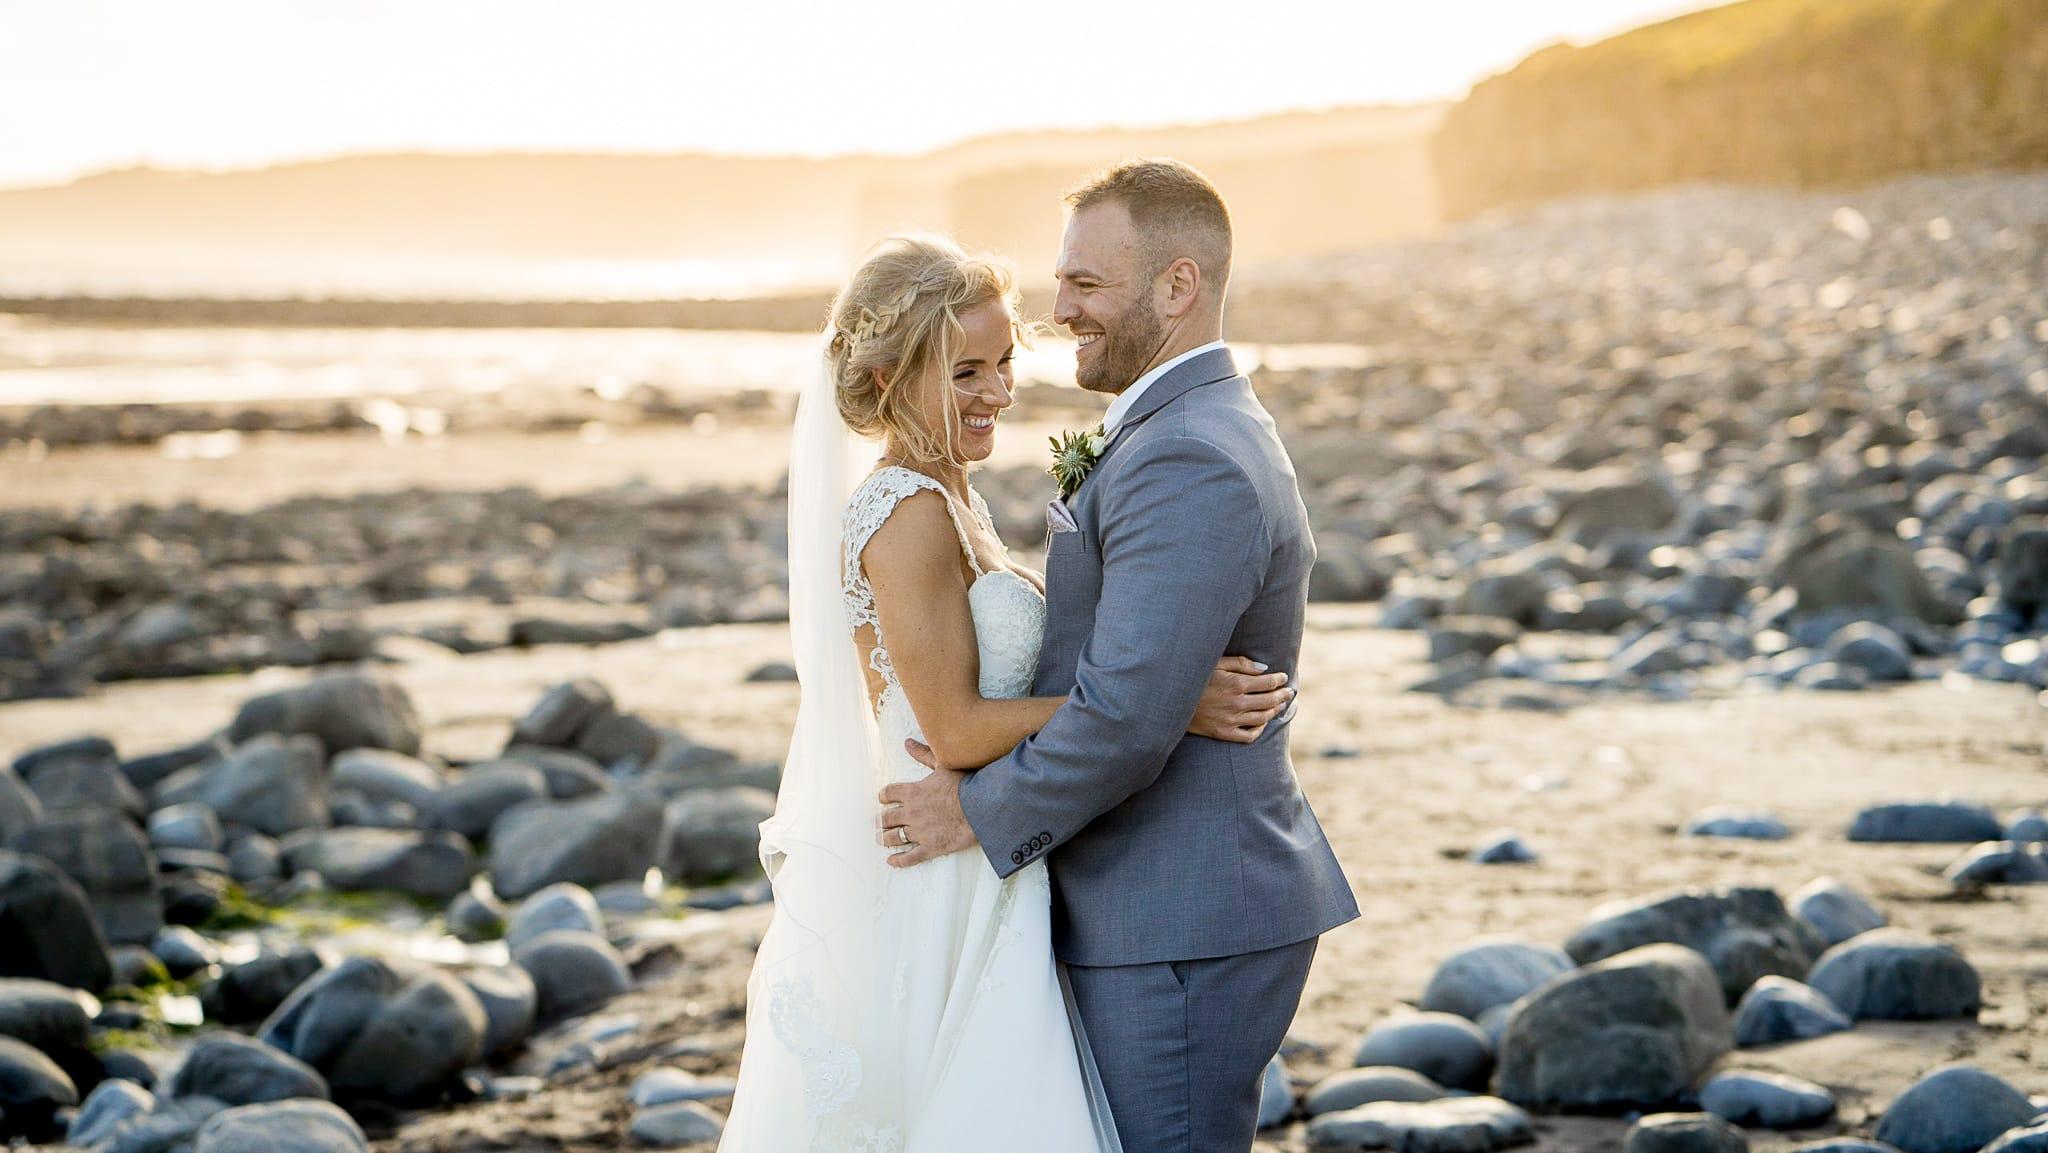 Wedding-day-timeline-planning